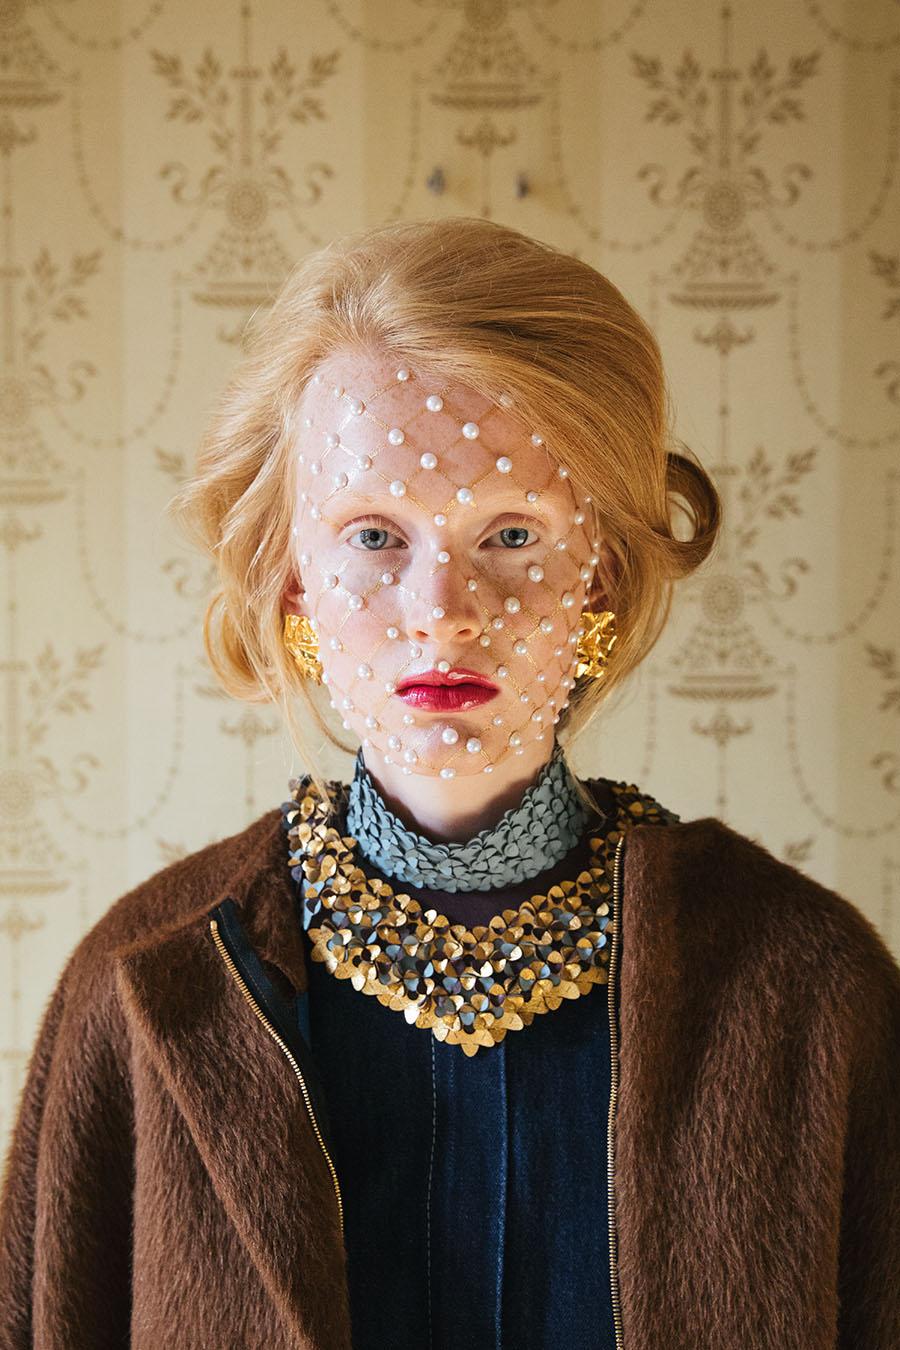 Fotograaf: Dasha Martynova,    Model: Benthe Prikken